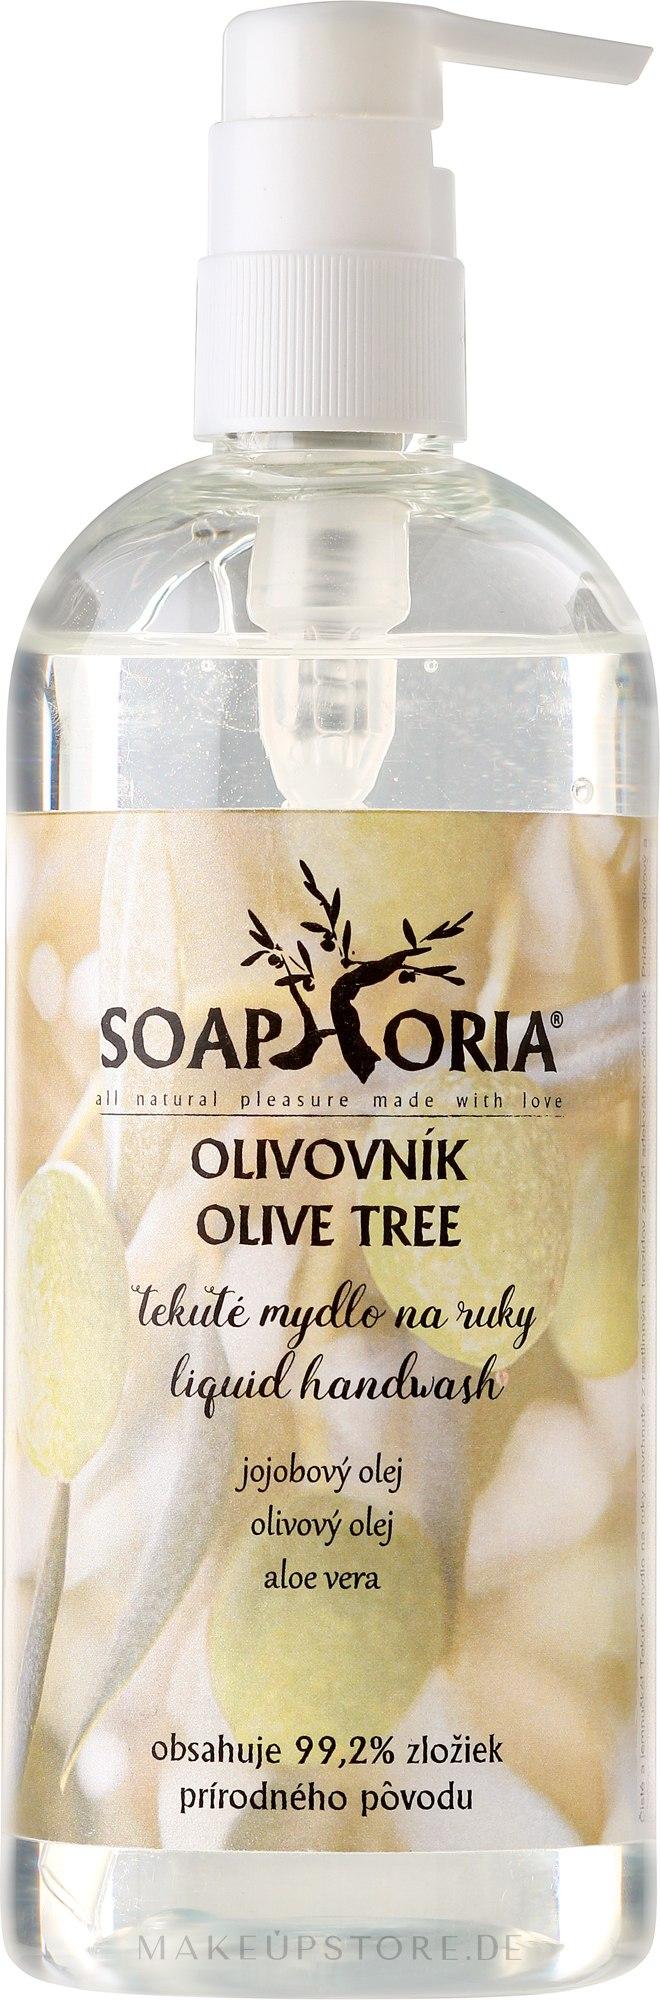 "Flüssige Handseife ""Schöllkraut"" - Soaphoria Olive Tree Liquid Hand Wash — Bild 400 ml"